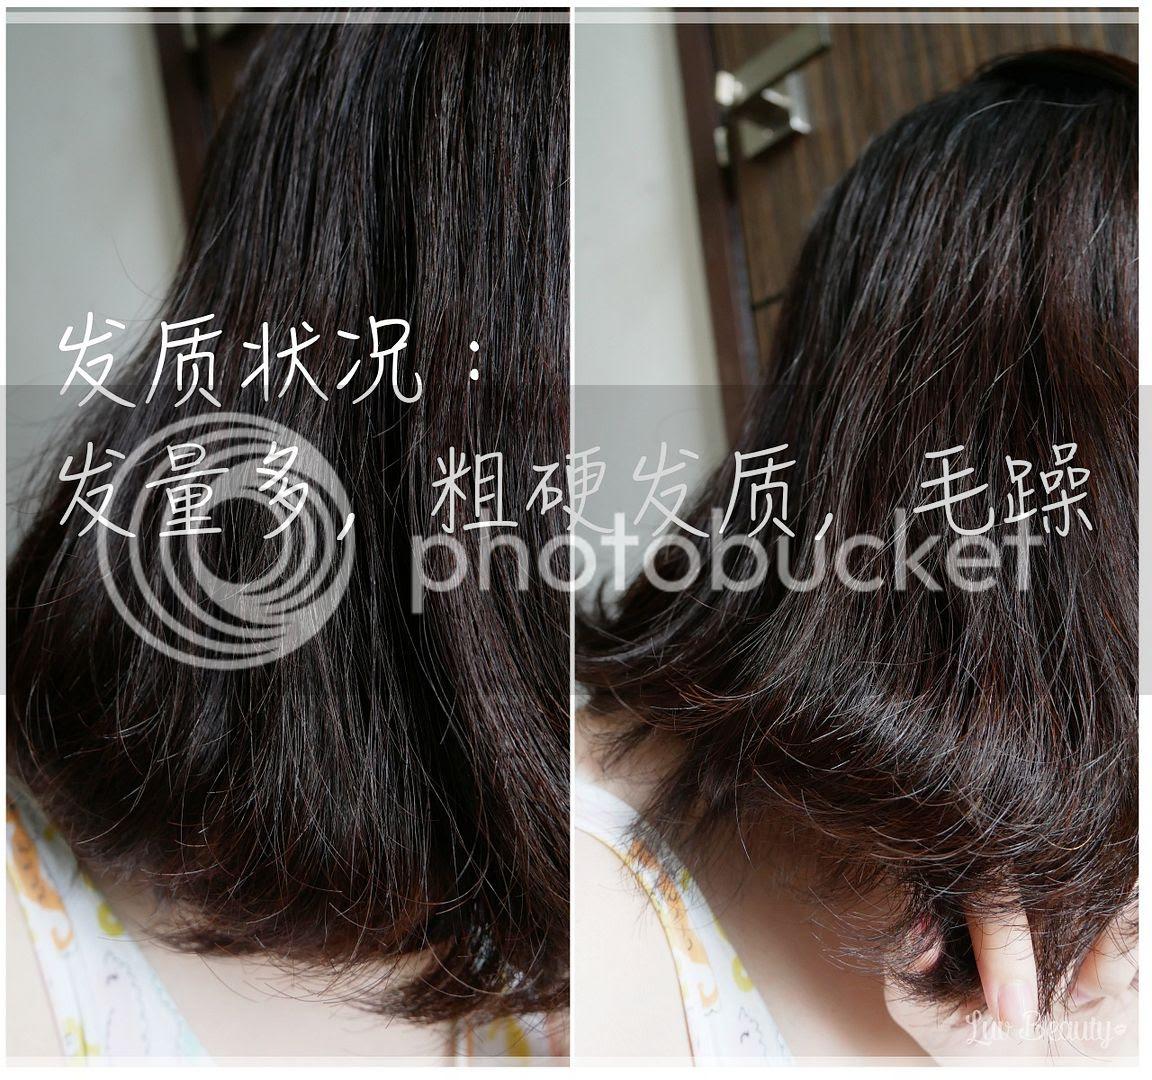 photo batch_before_zpsv4qyephj.jpg